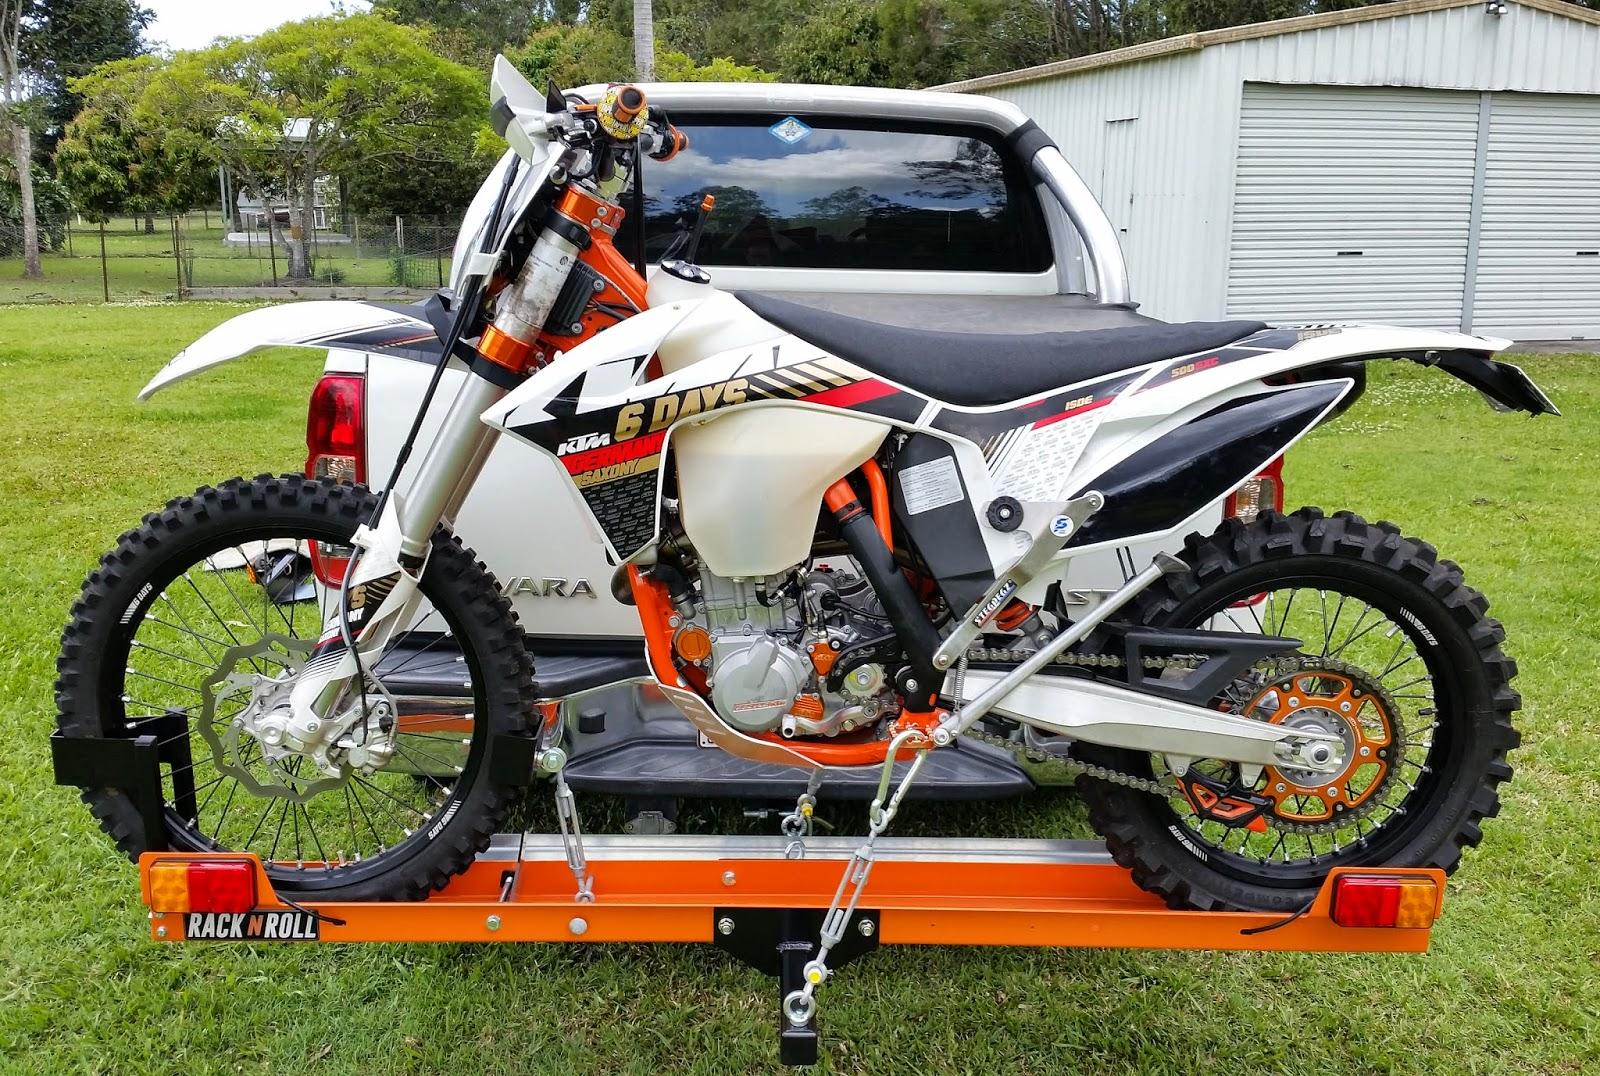 rack n roll motorcycle carrier off 55 www transanatolie com